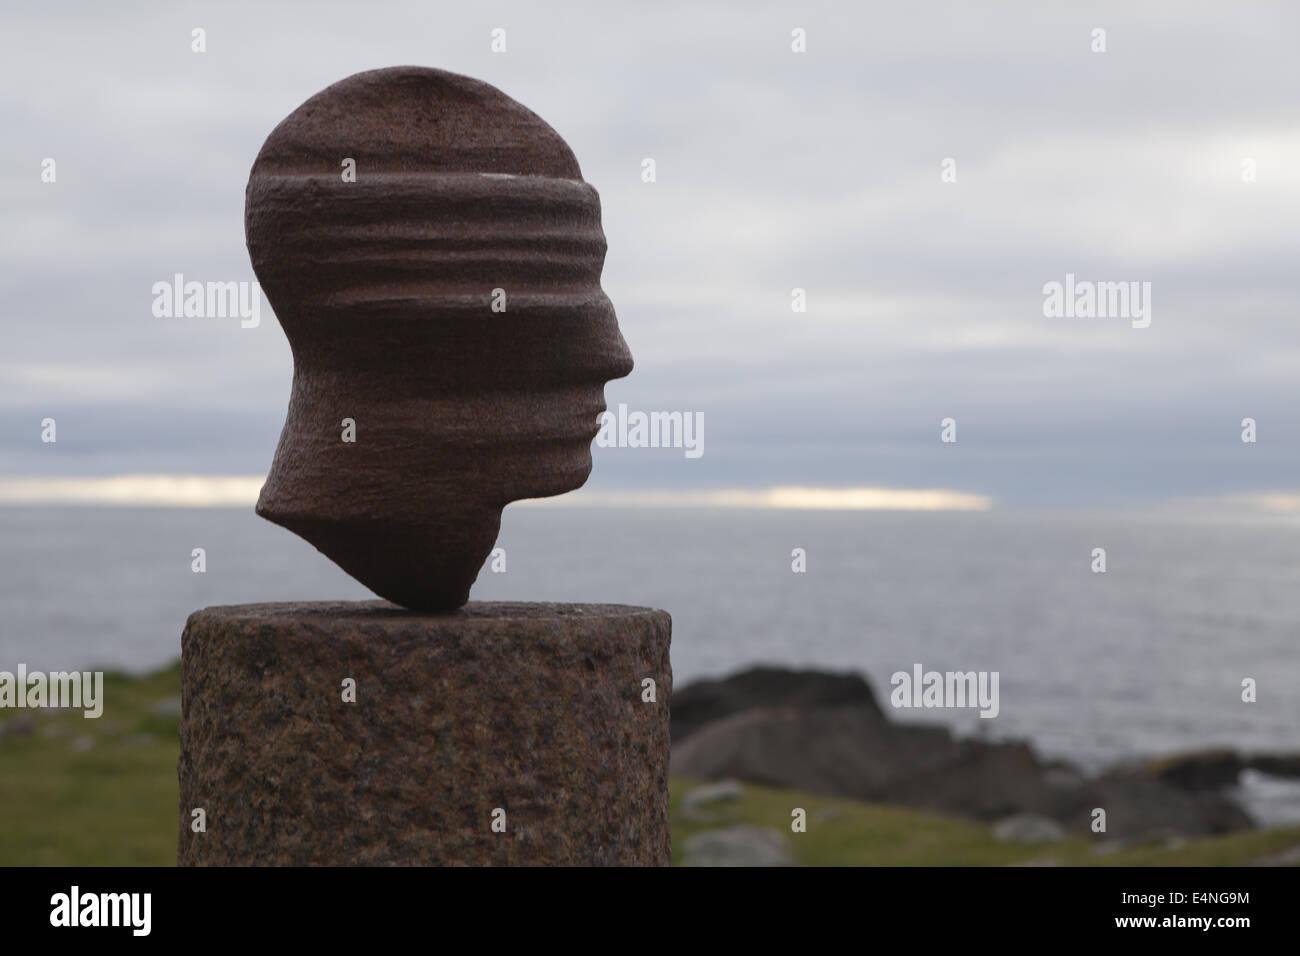 Sculpture Head, Vestvågøy; Norway - Stock Image